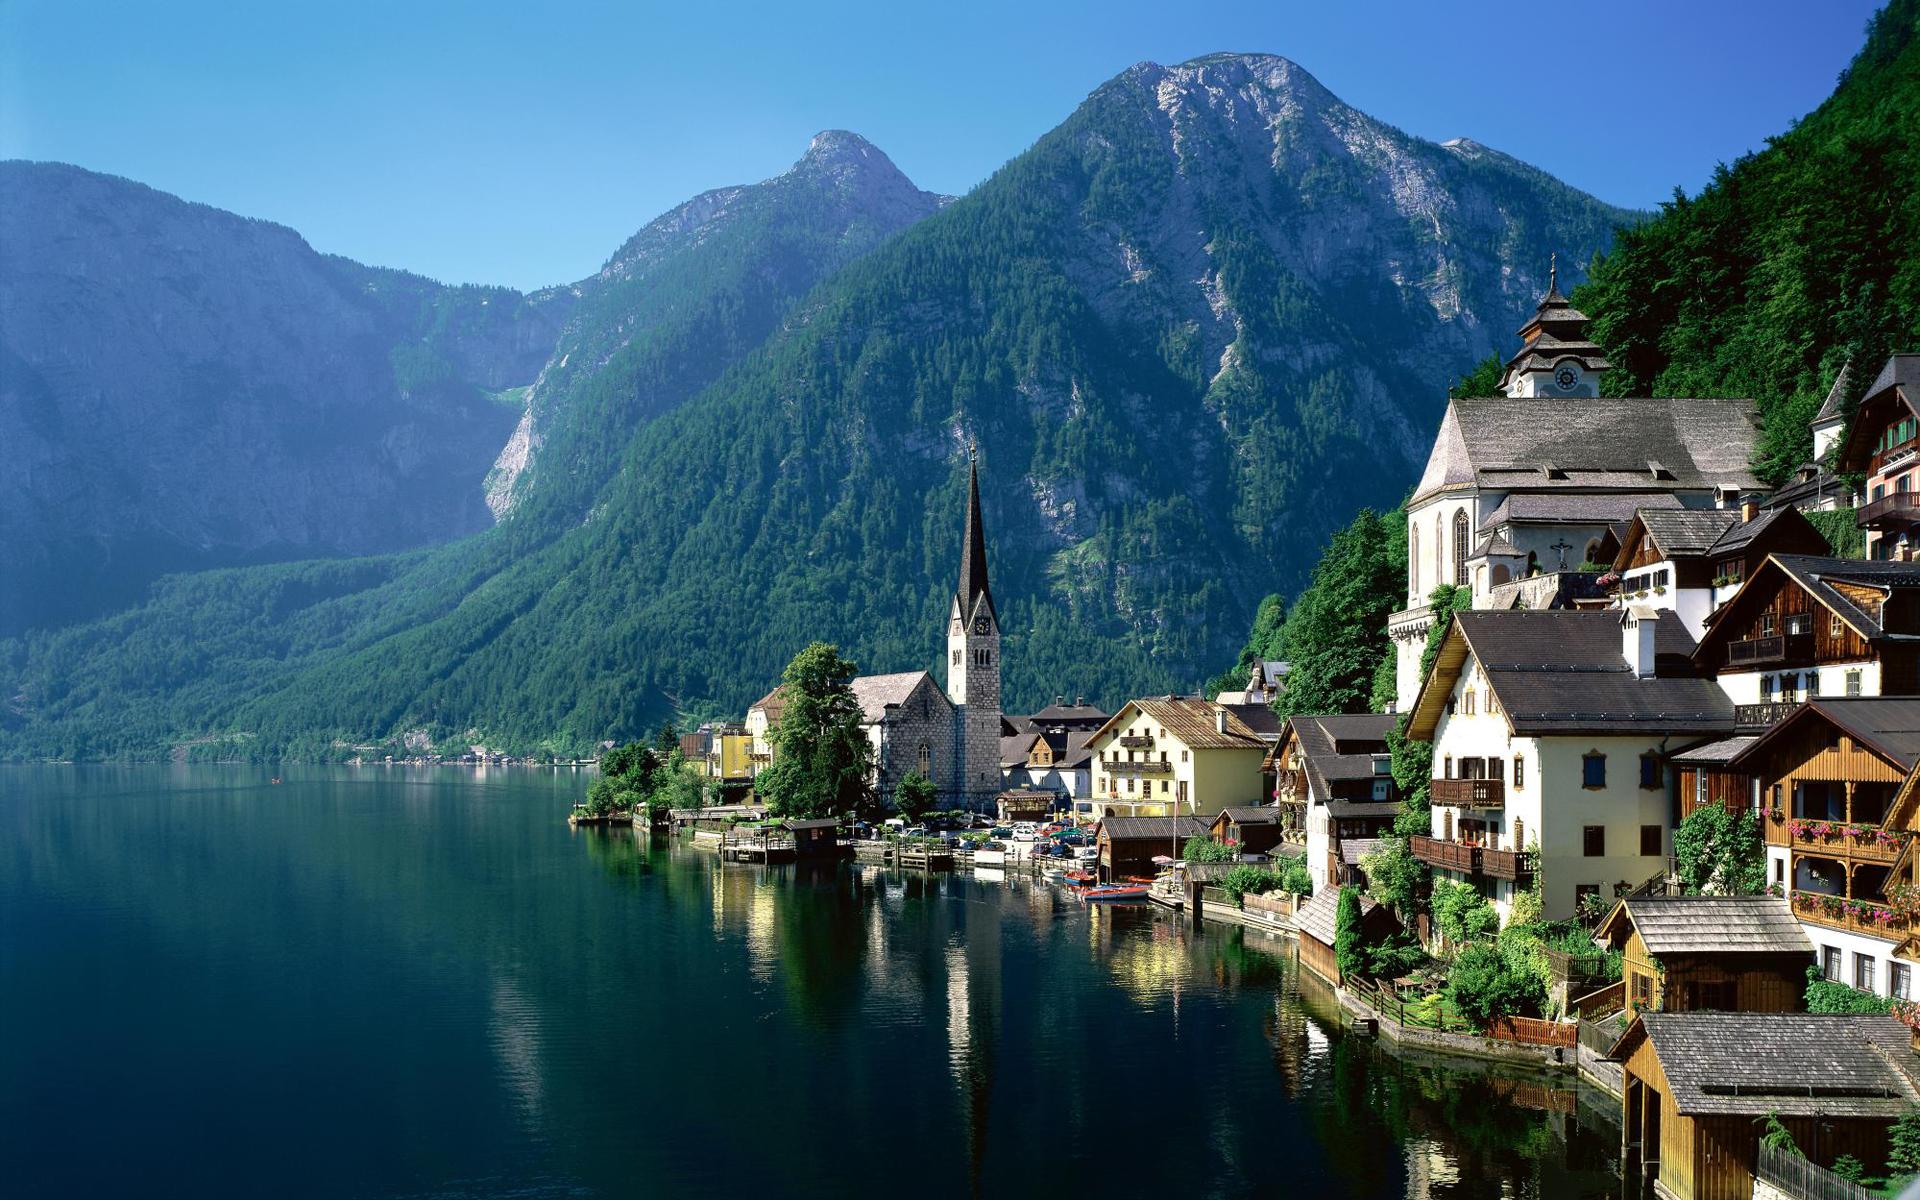 Germany lakes mountains wallpaper HQ WALLPAPER - (#177047)